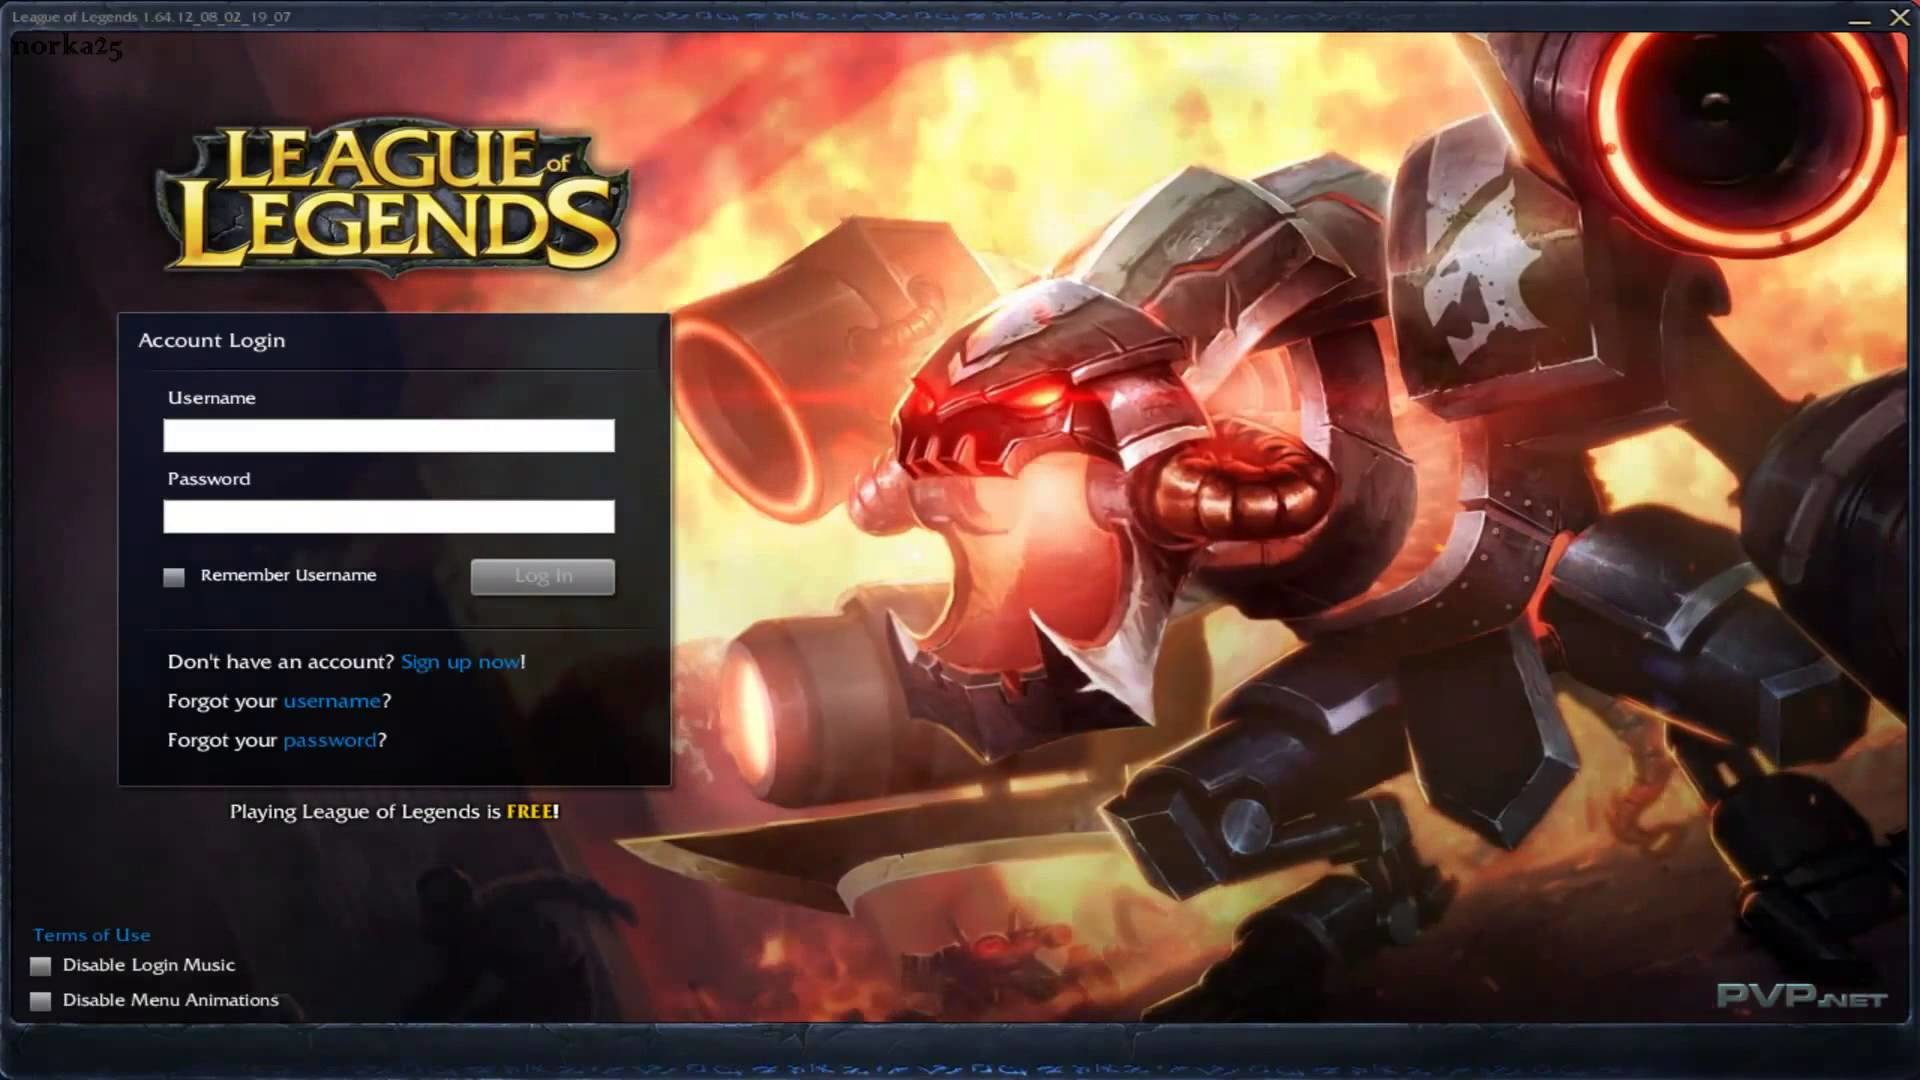 Res: 1920x1080, League of Legends - Legendary Battlecast Cho'Gath - Login Screen and Music  HD - YouTube